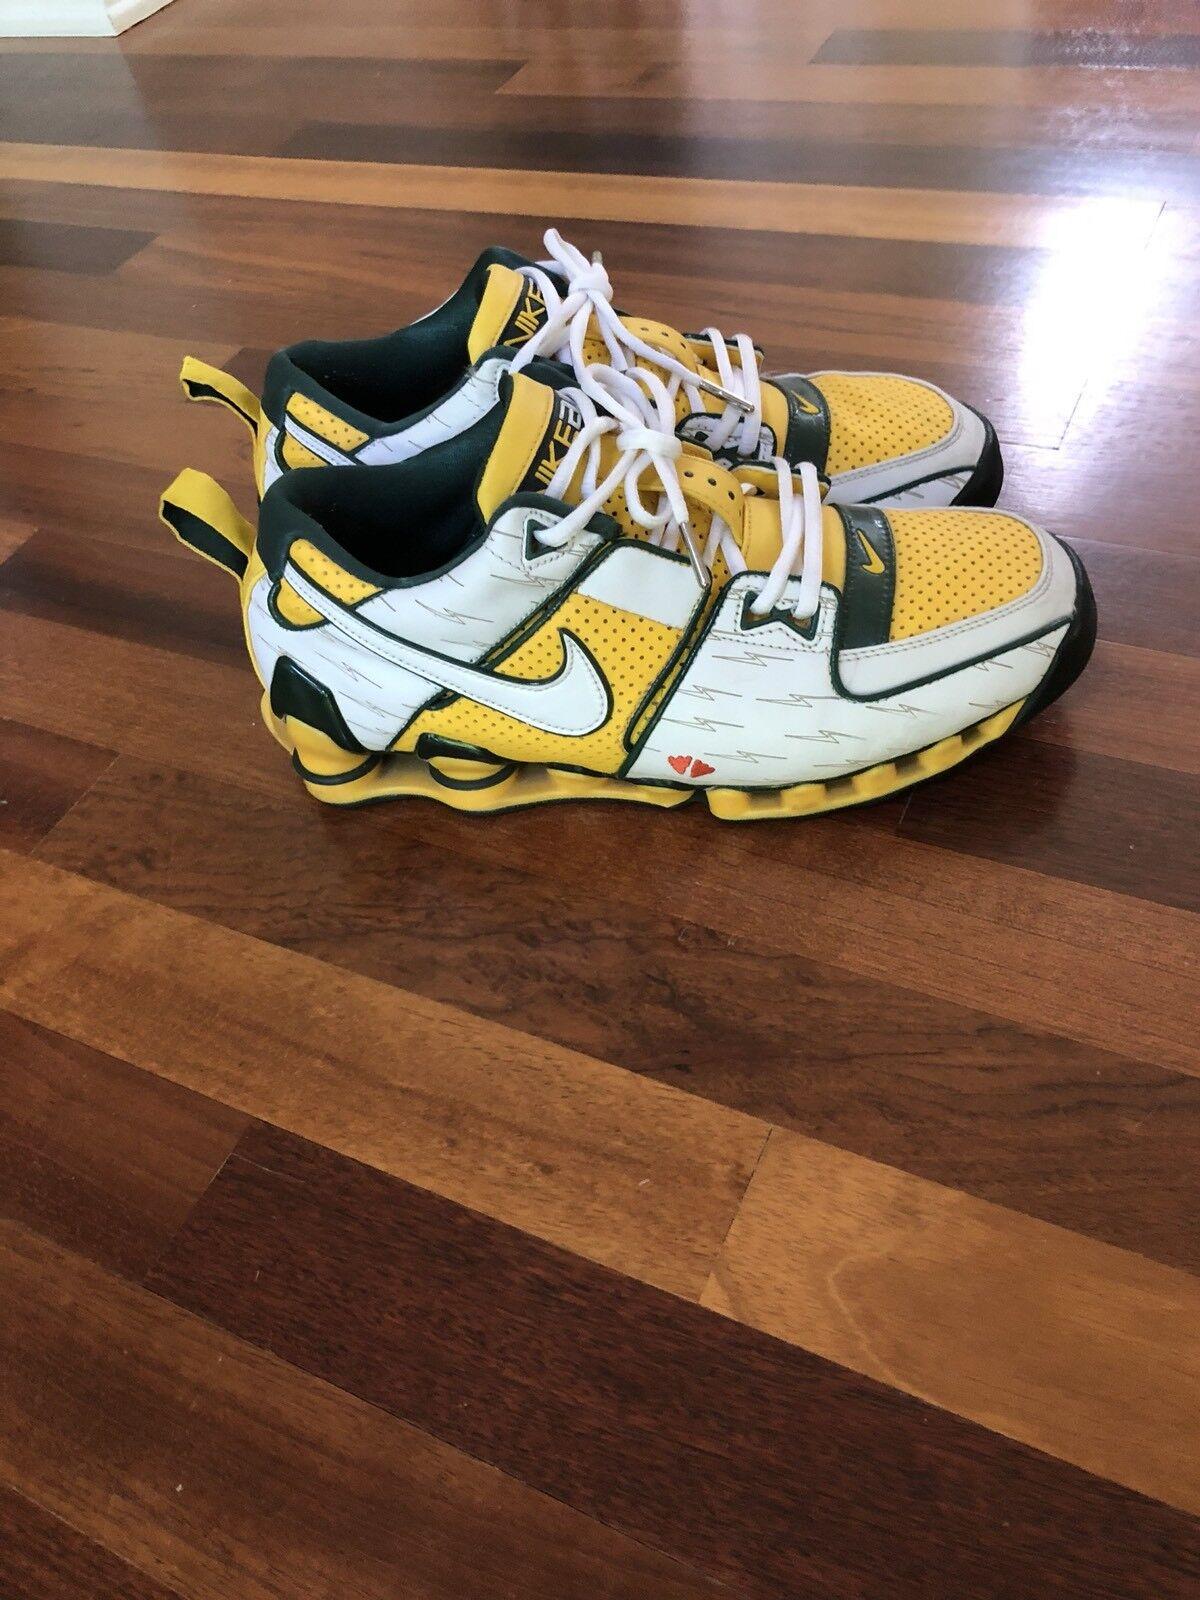 Nike oregon elite doernbecher scarpe taglia 10